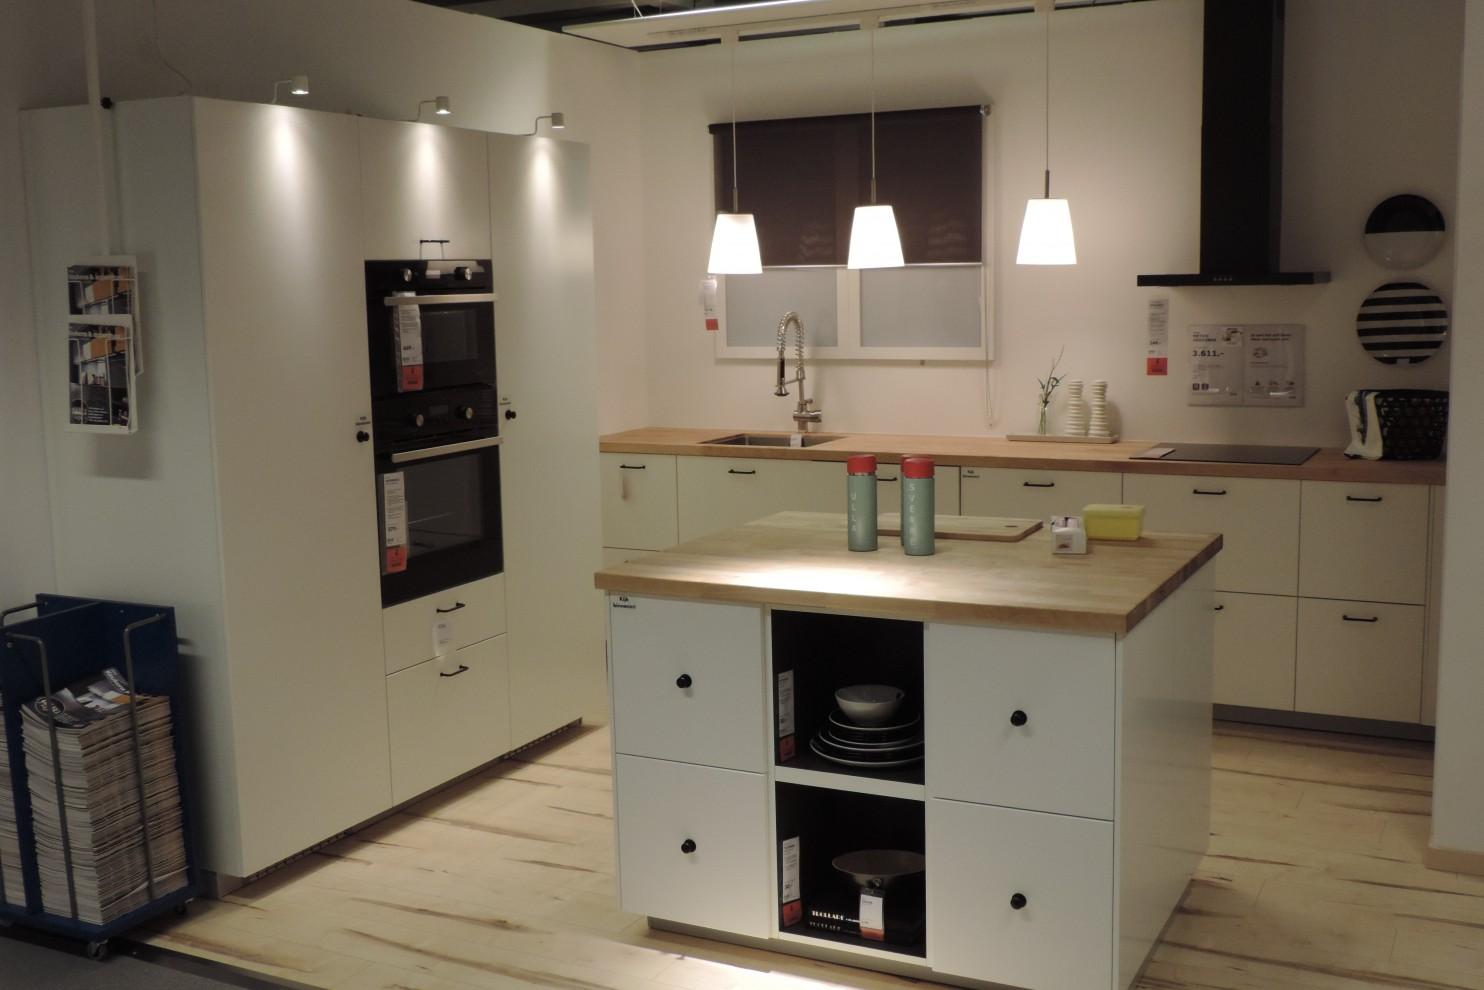 ikea stamhuis. Black Bedroom Furniture Sets. Home Design Ideas